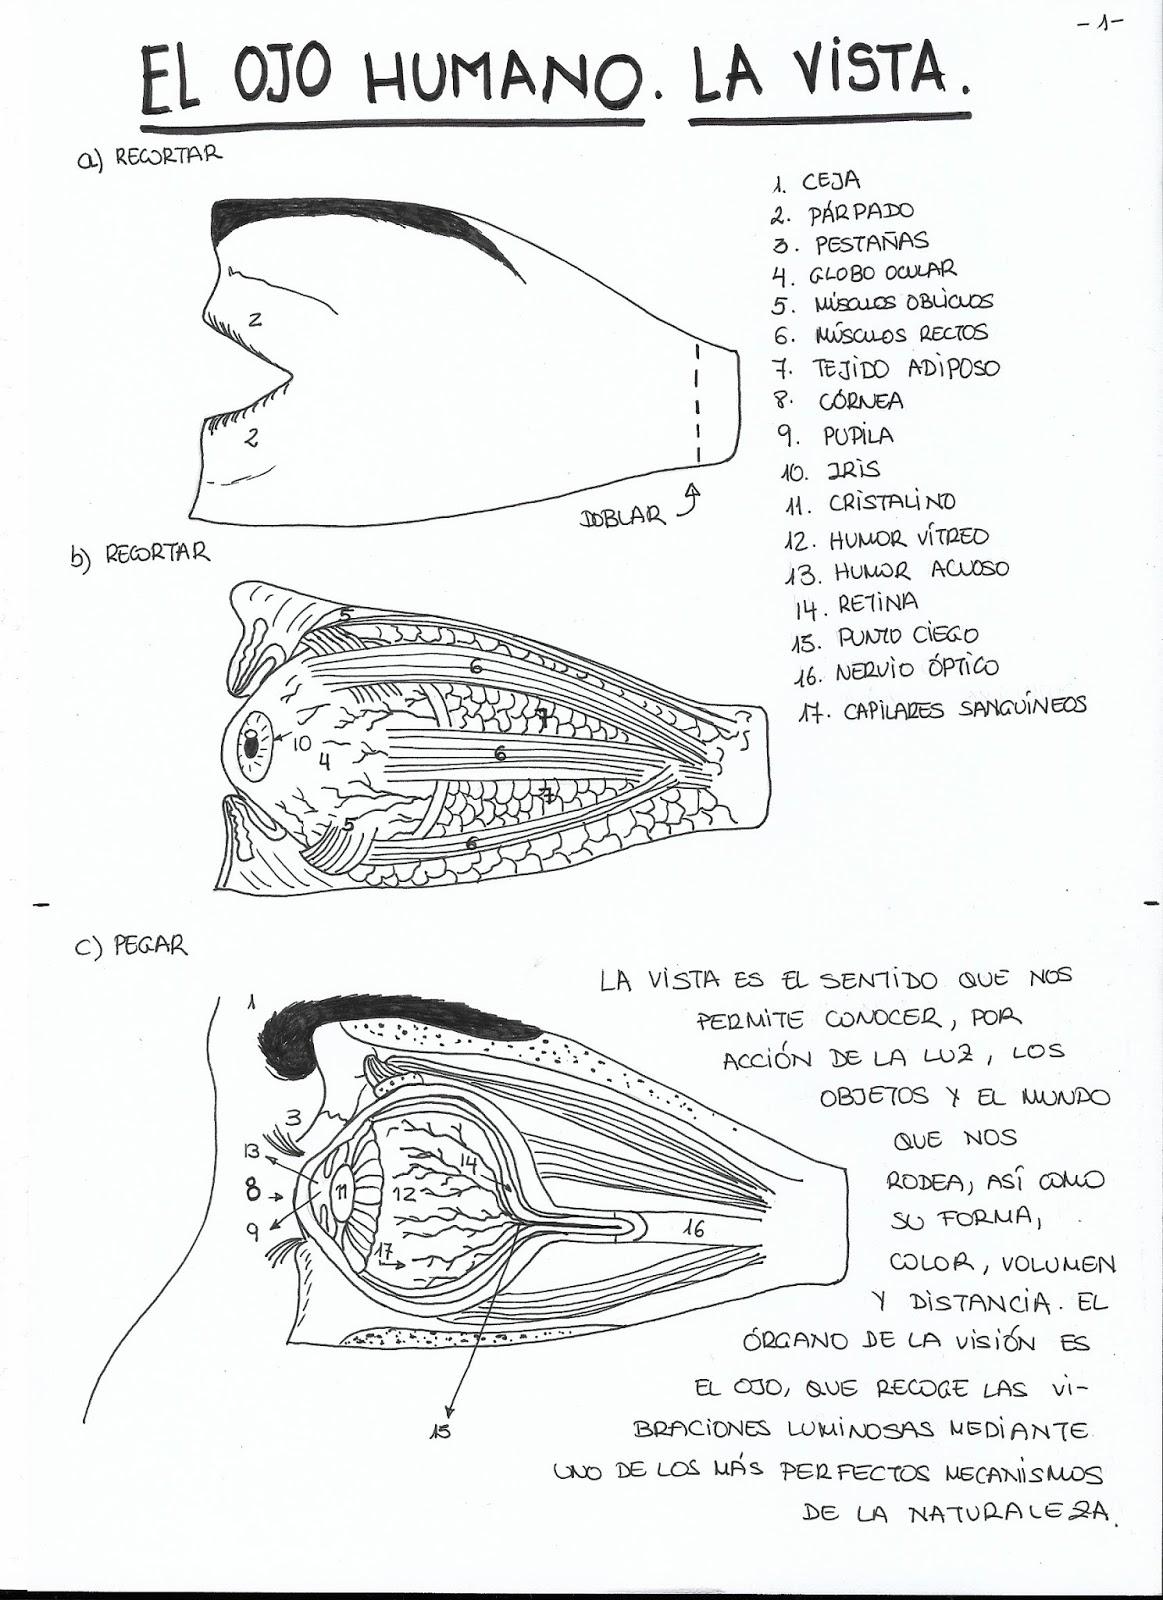 Plasticlass: Anatomía del ojo humano. La vista.